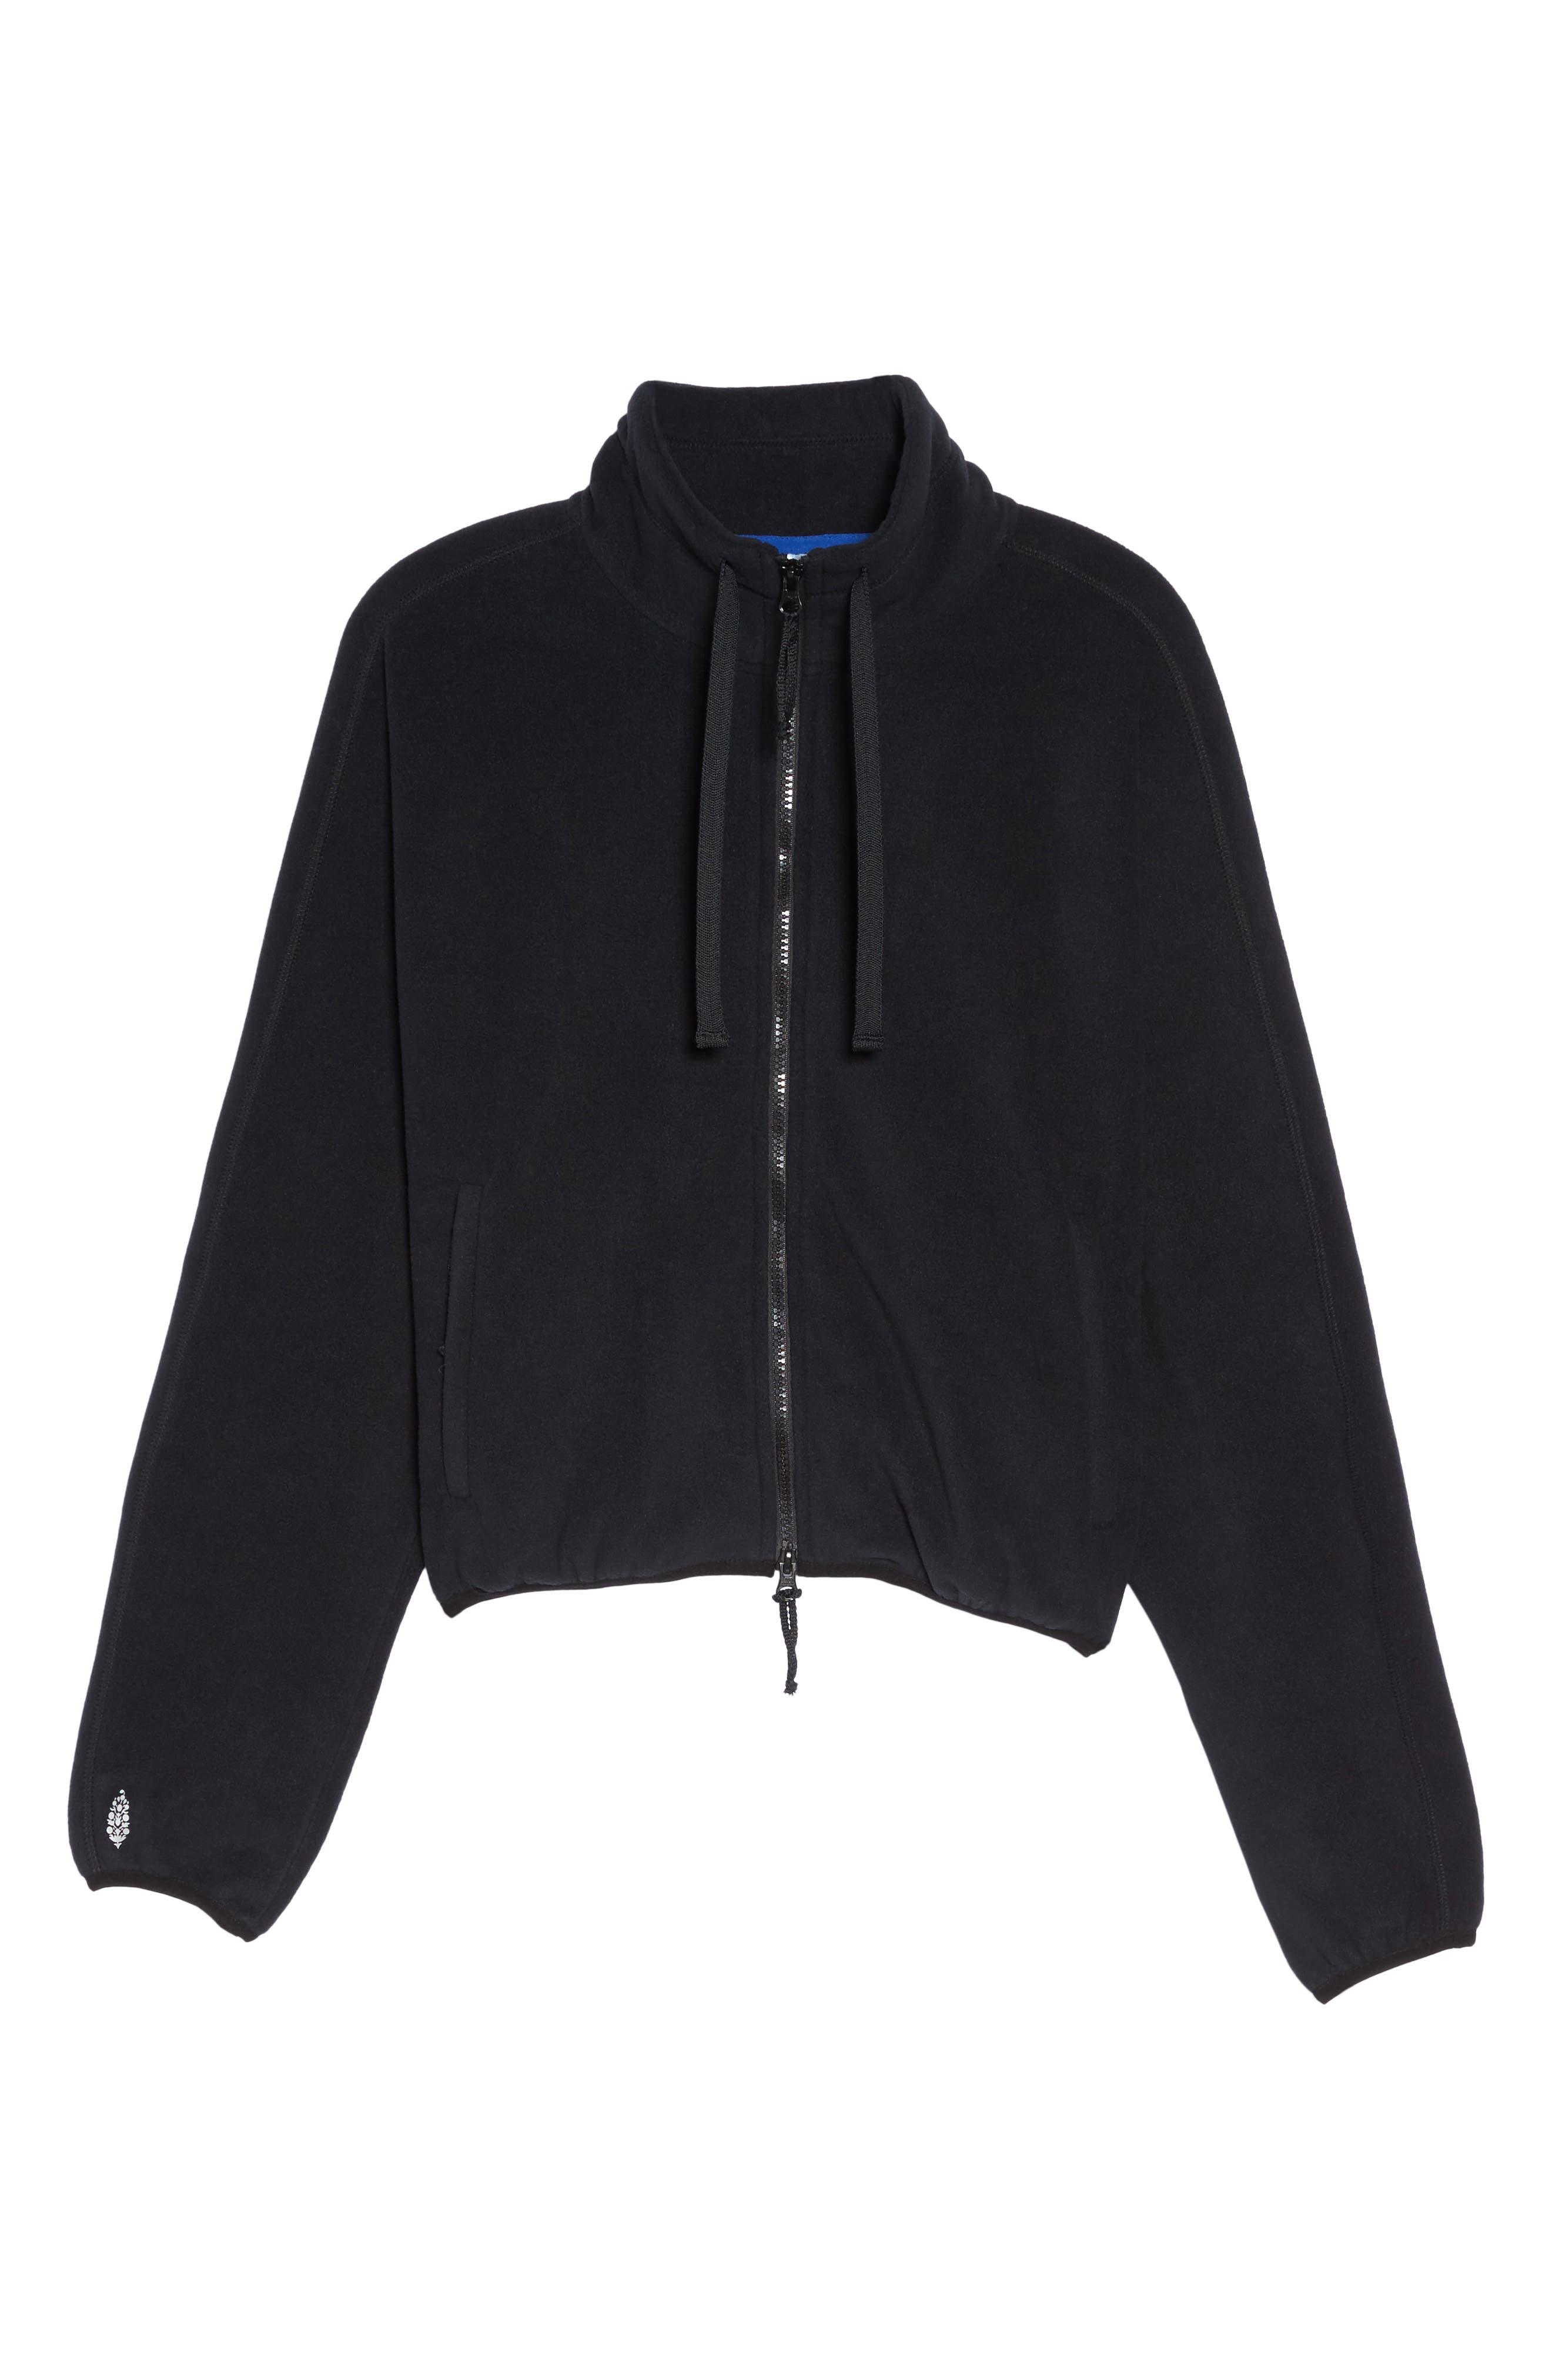 FP Movement Higher Ground Fleece Jacket,                             Alternate thumbnail 12, color,